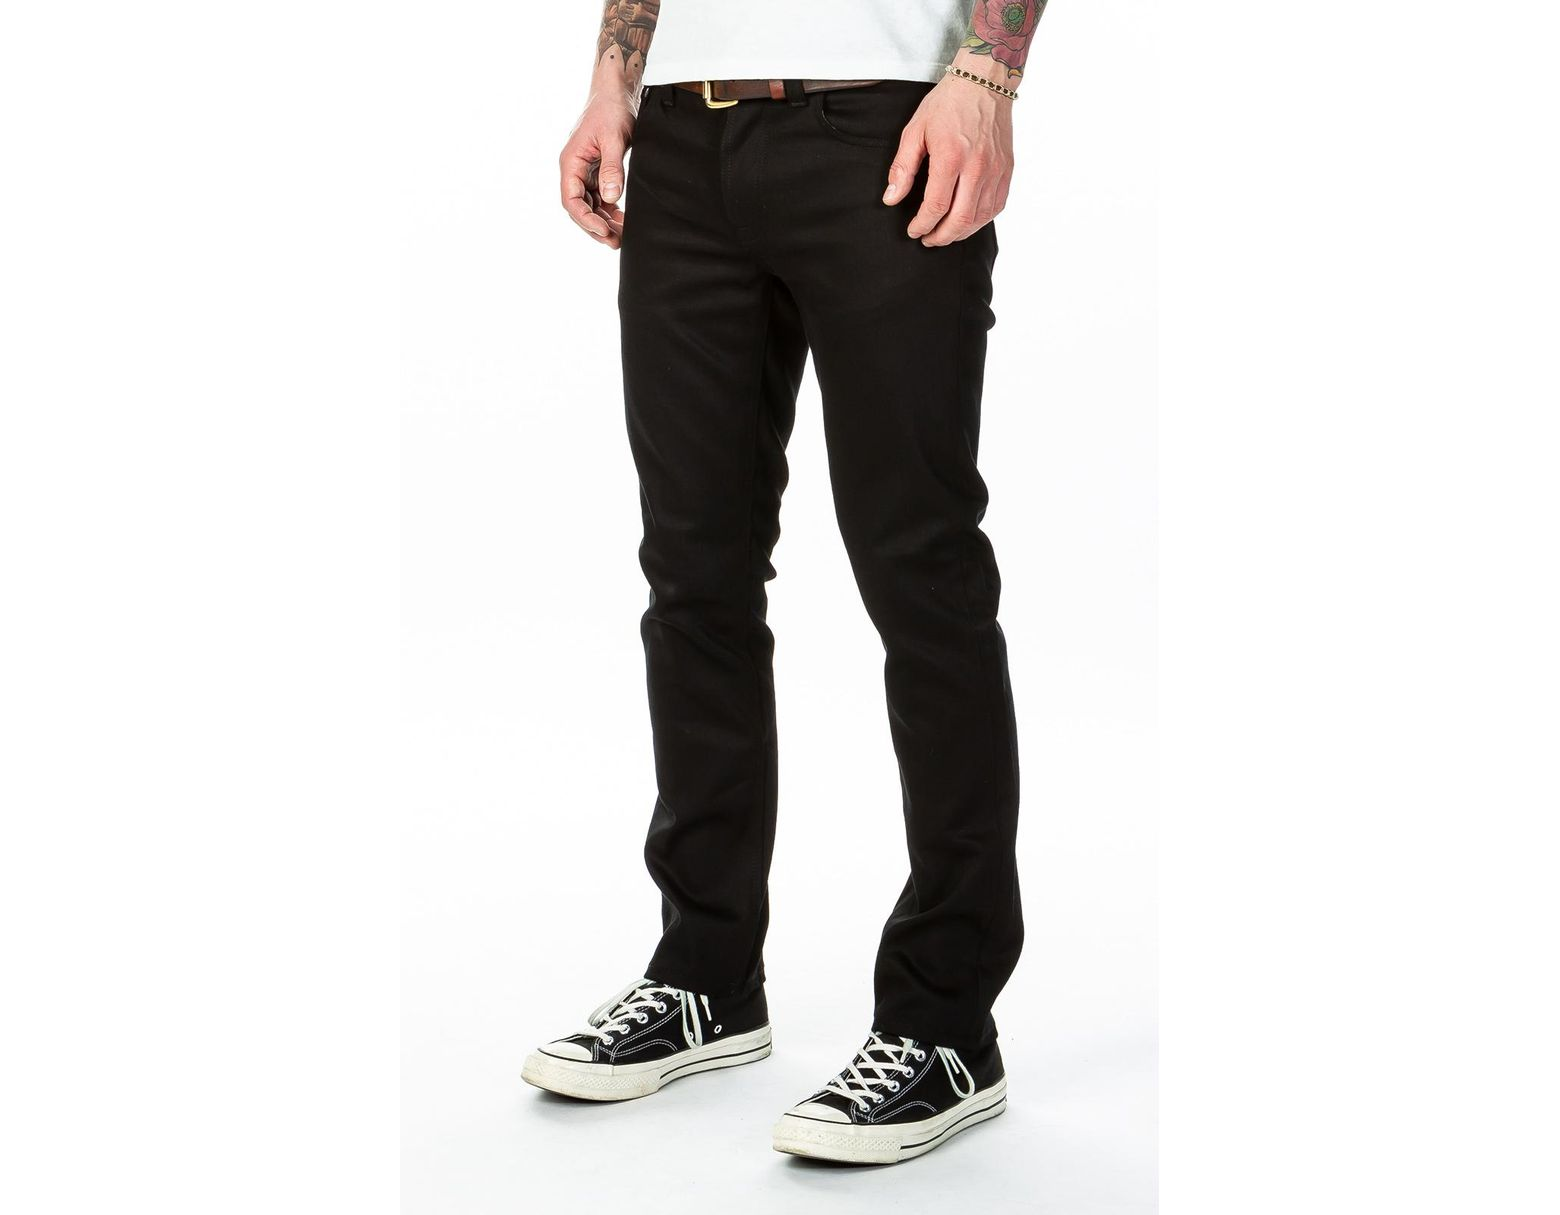 a869135b Nudie Jeans Grim Tim Dry Ever Black in Black for Men - Save 2% - Lyst